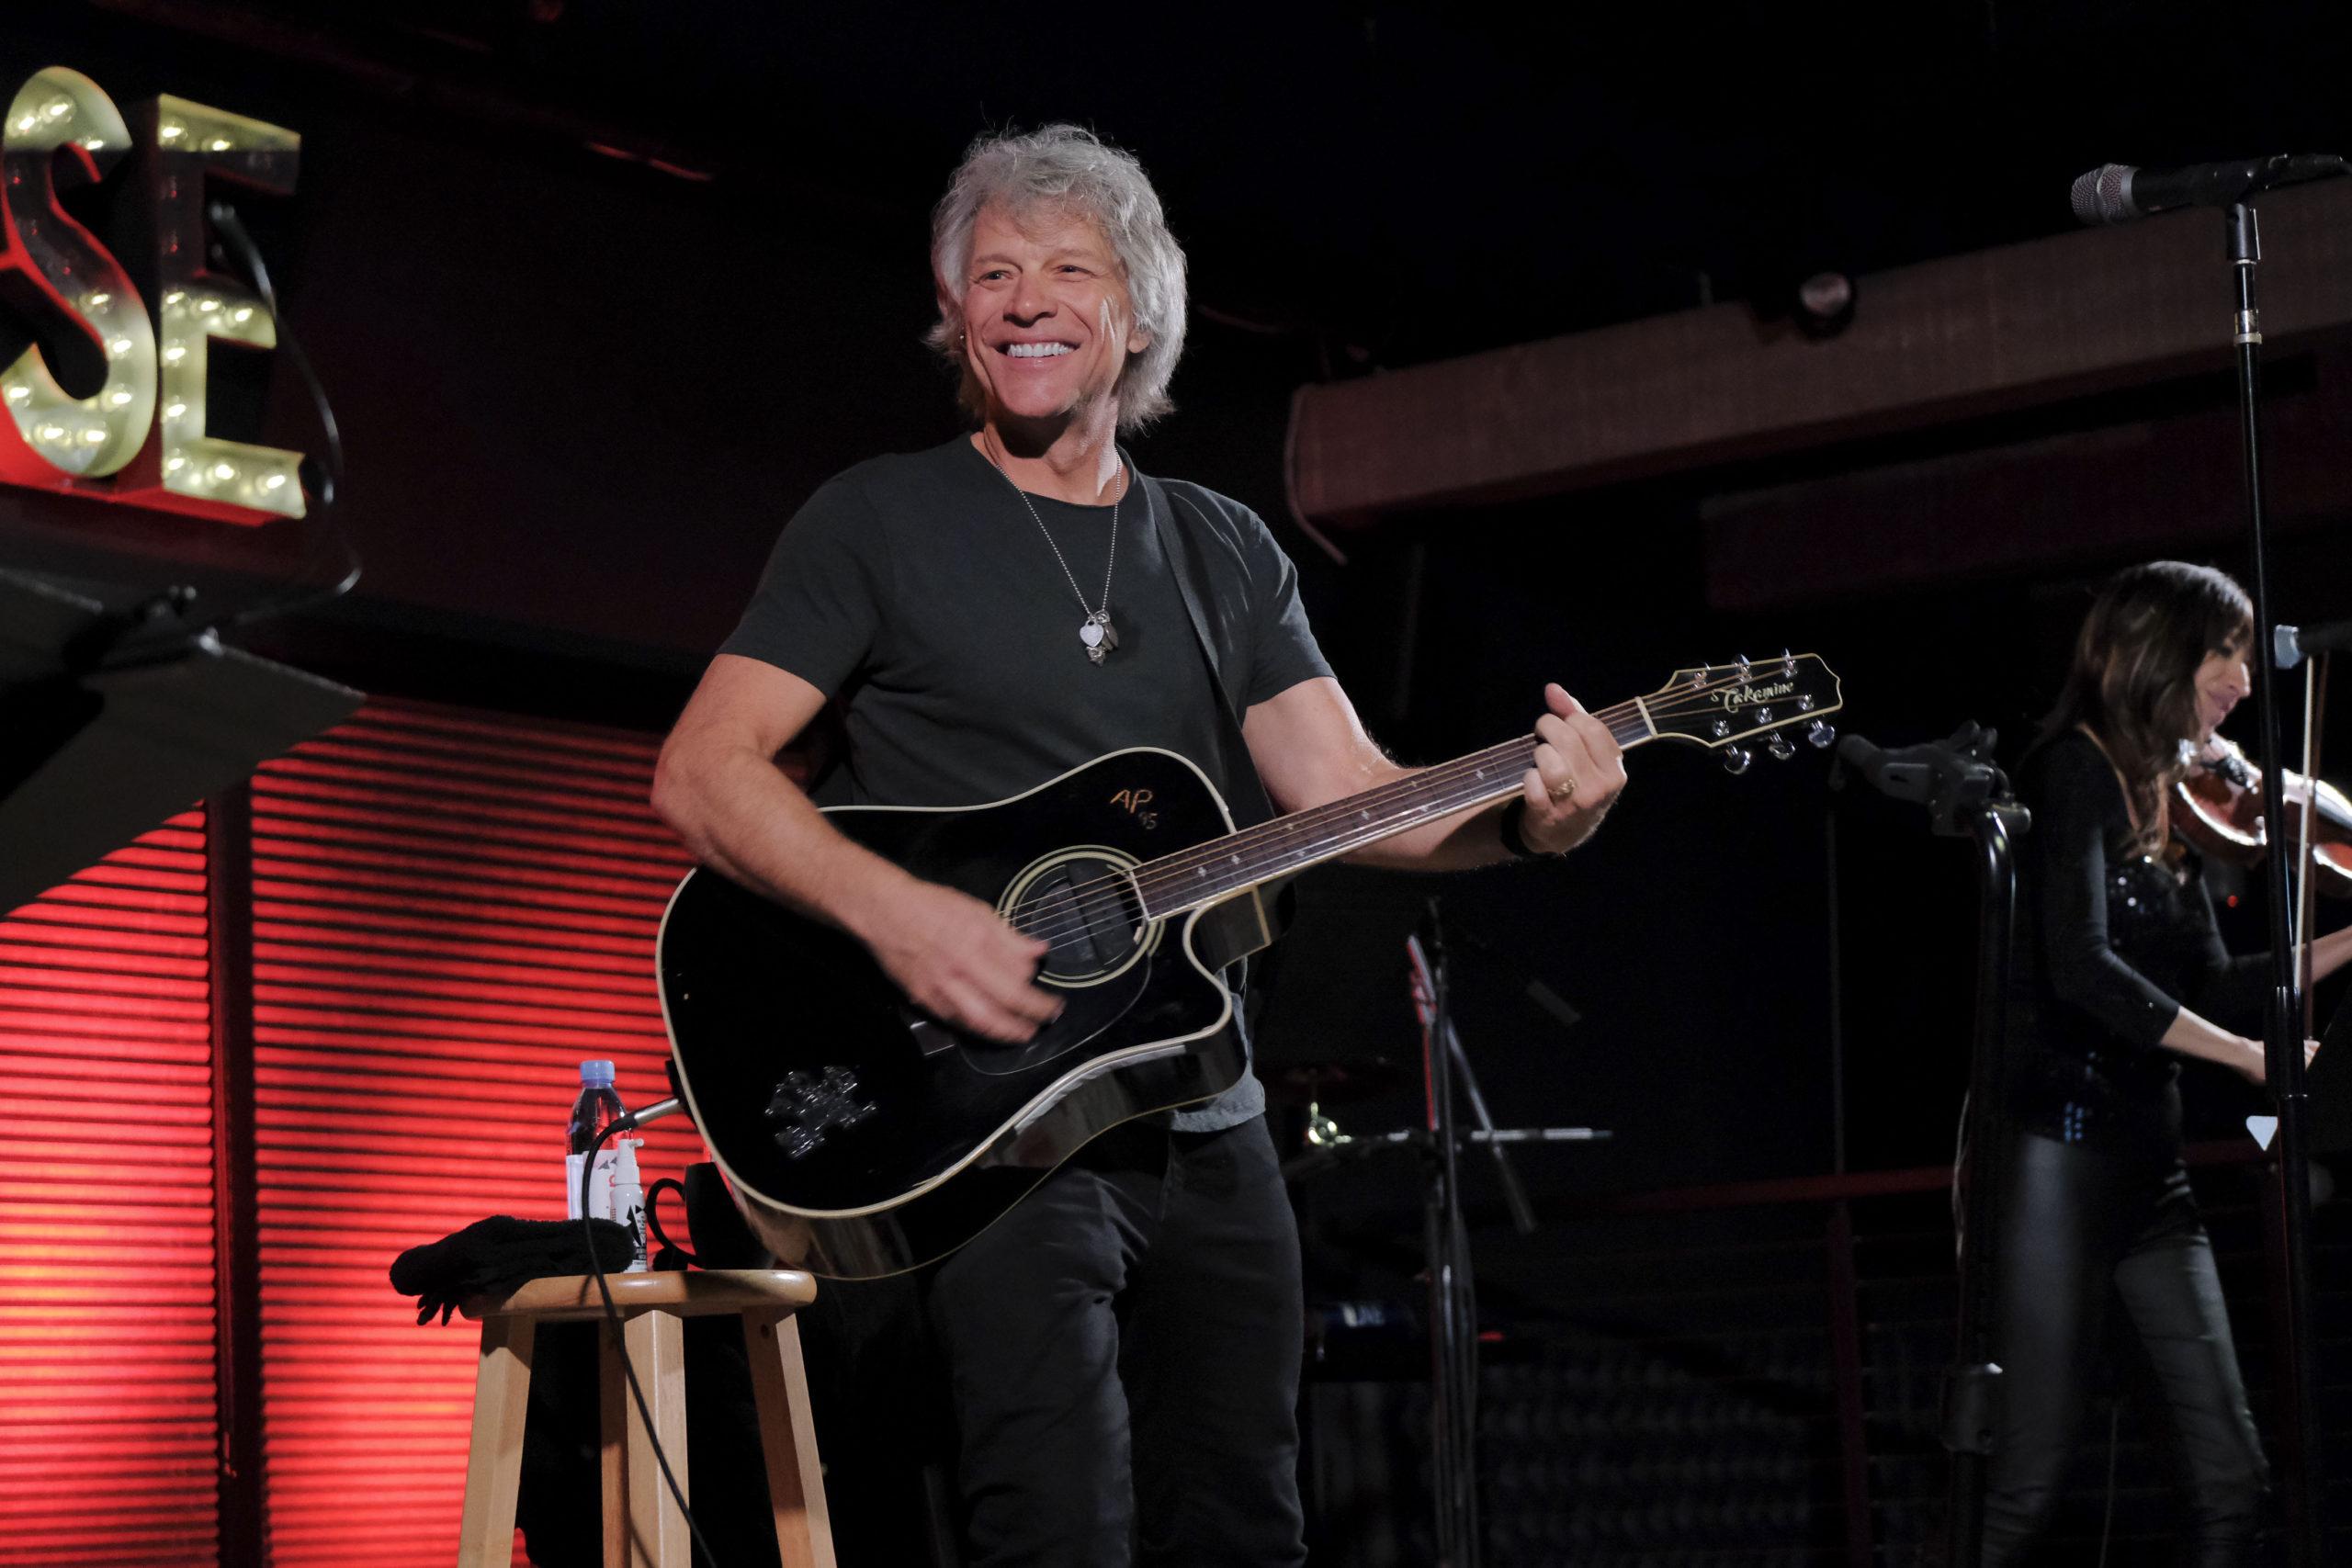 Jon Bon Jovi performing at The Clubhouse Friday night. Photo credit: